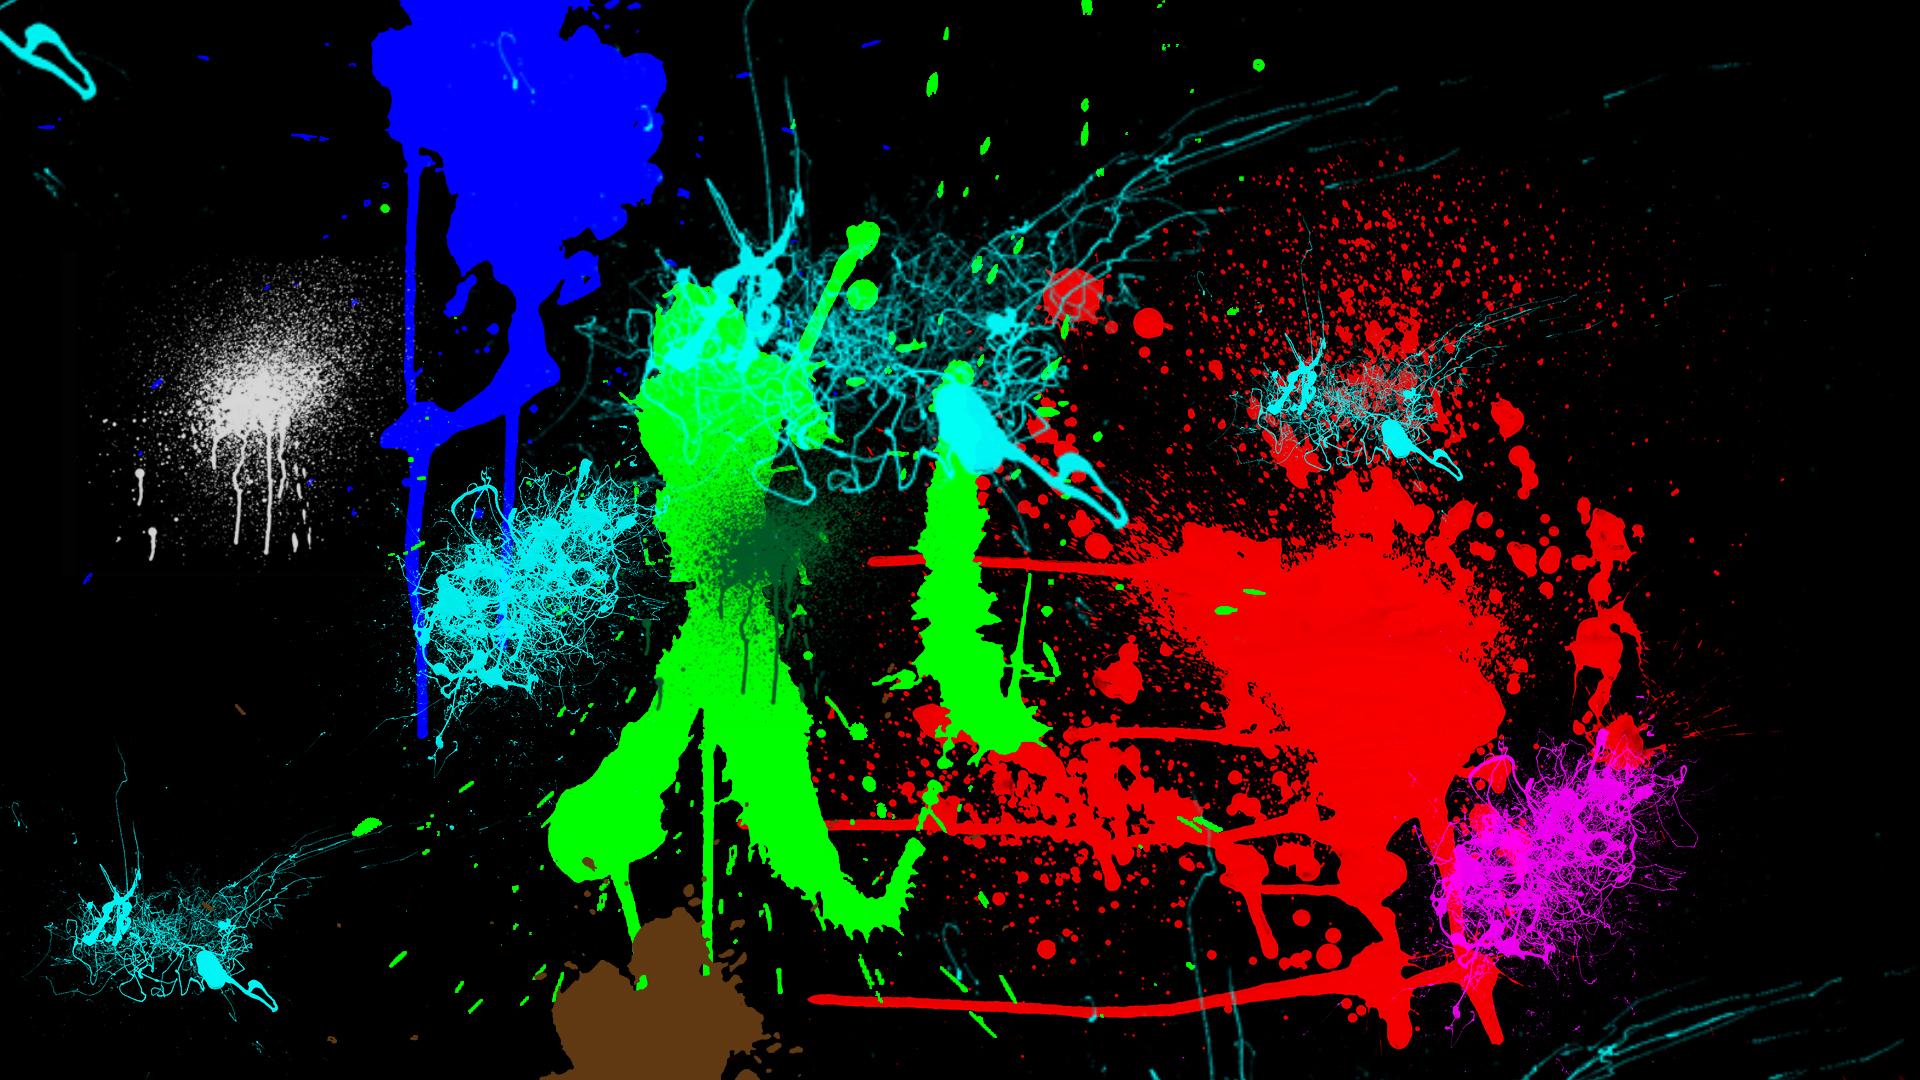 colourful hd 1080p wallpaper - photo #19